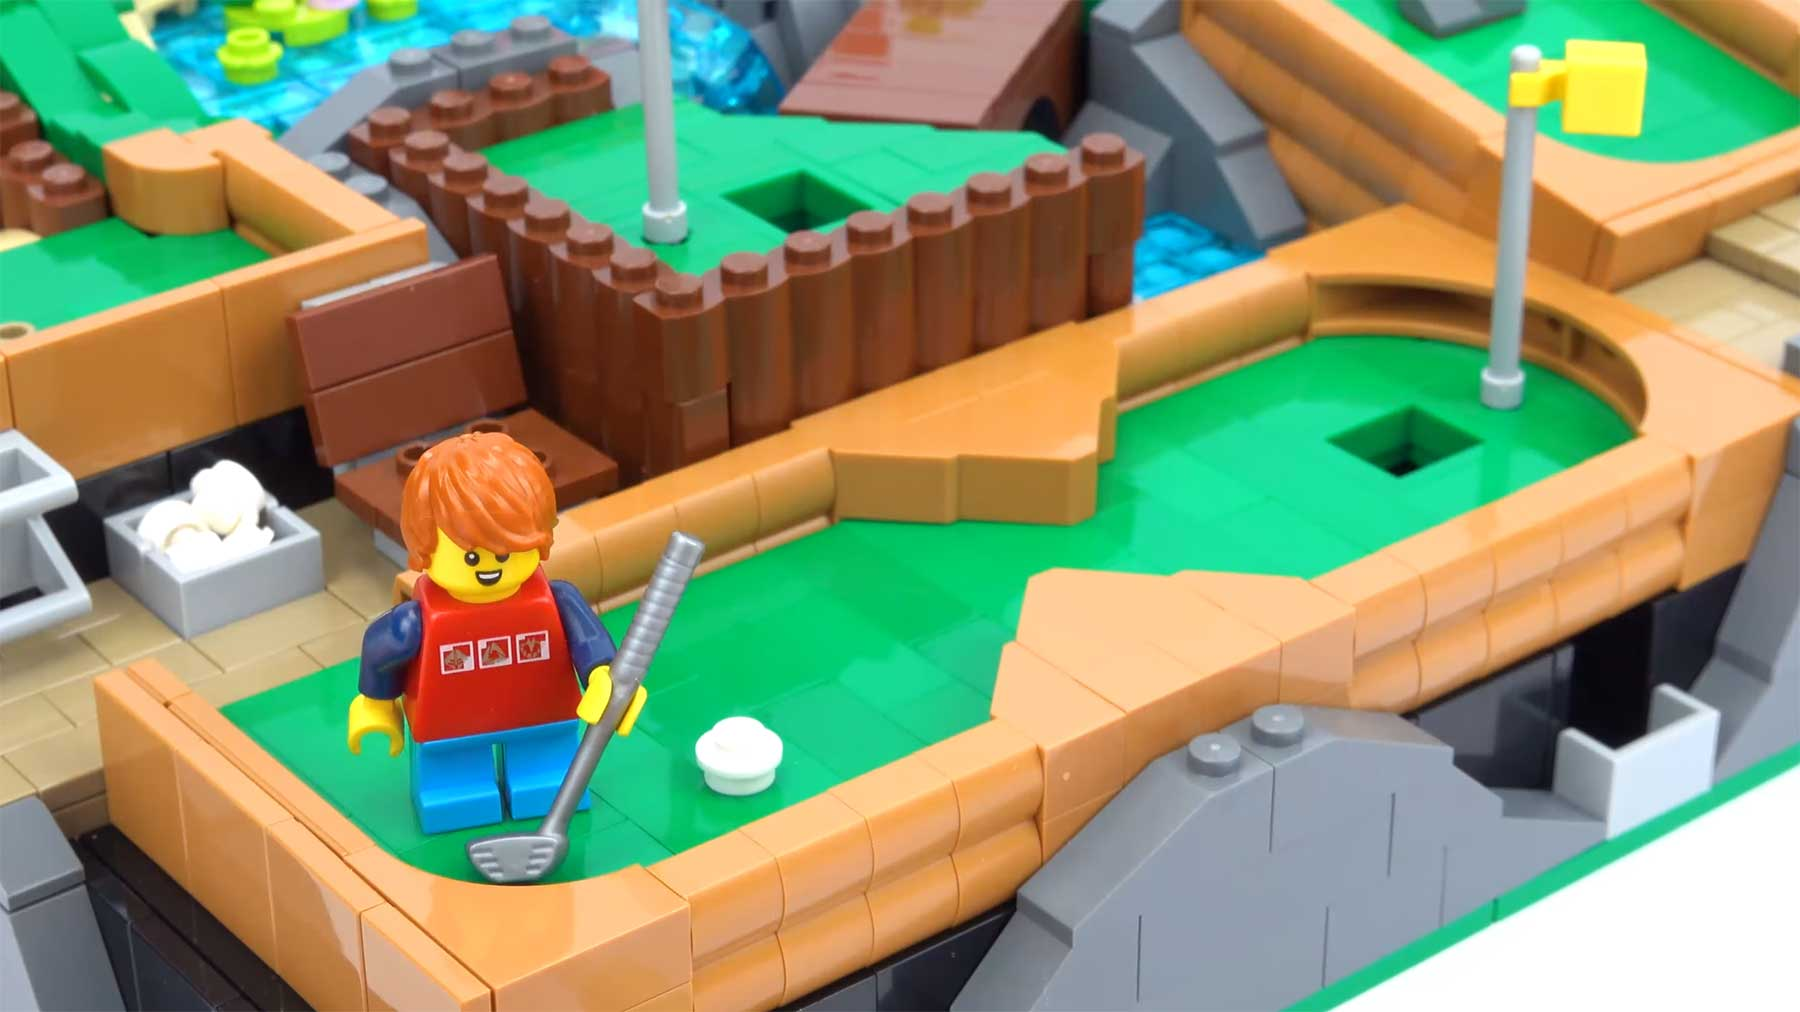 Spielbarer LEGO-Minigolfplatz